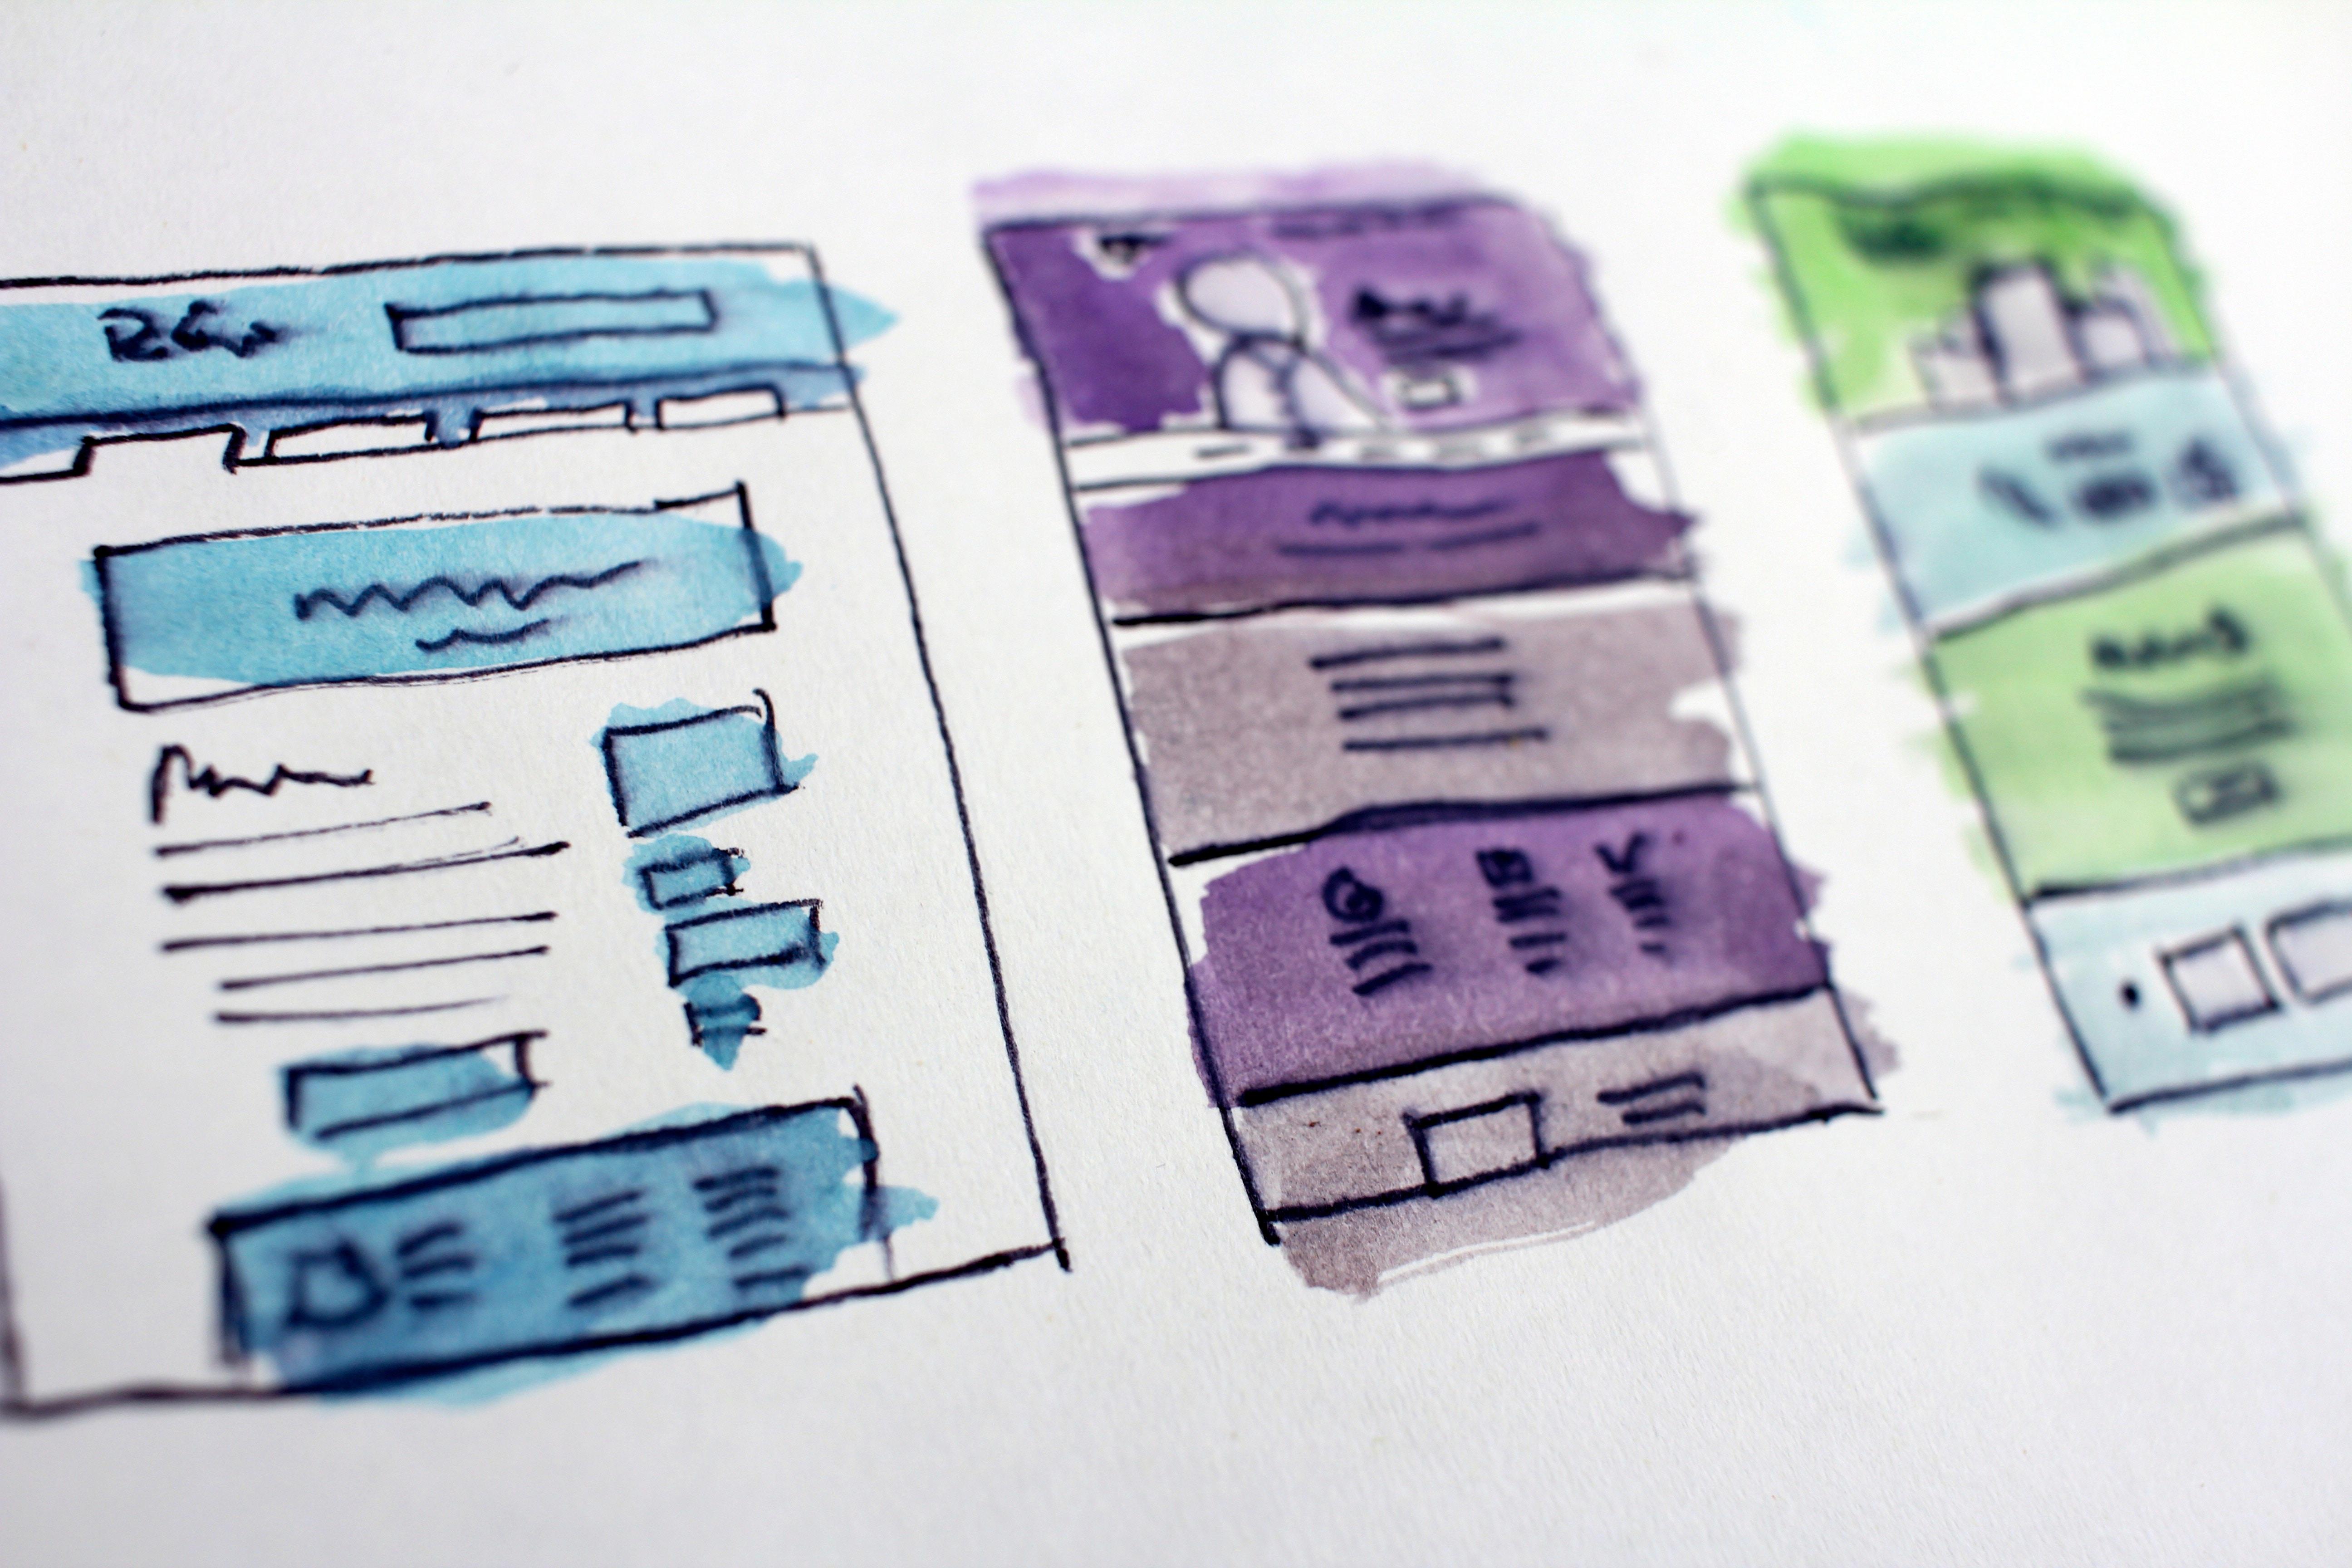 Design sprints wireframe